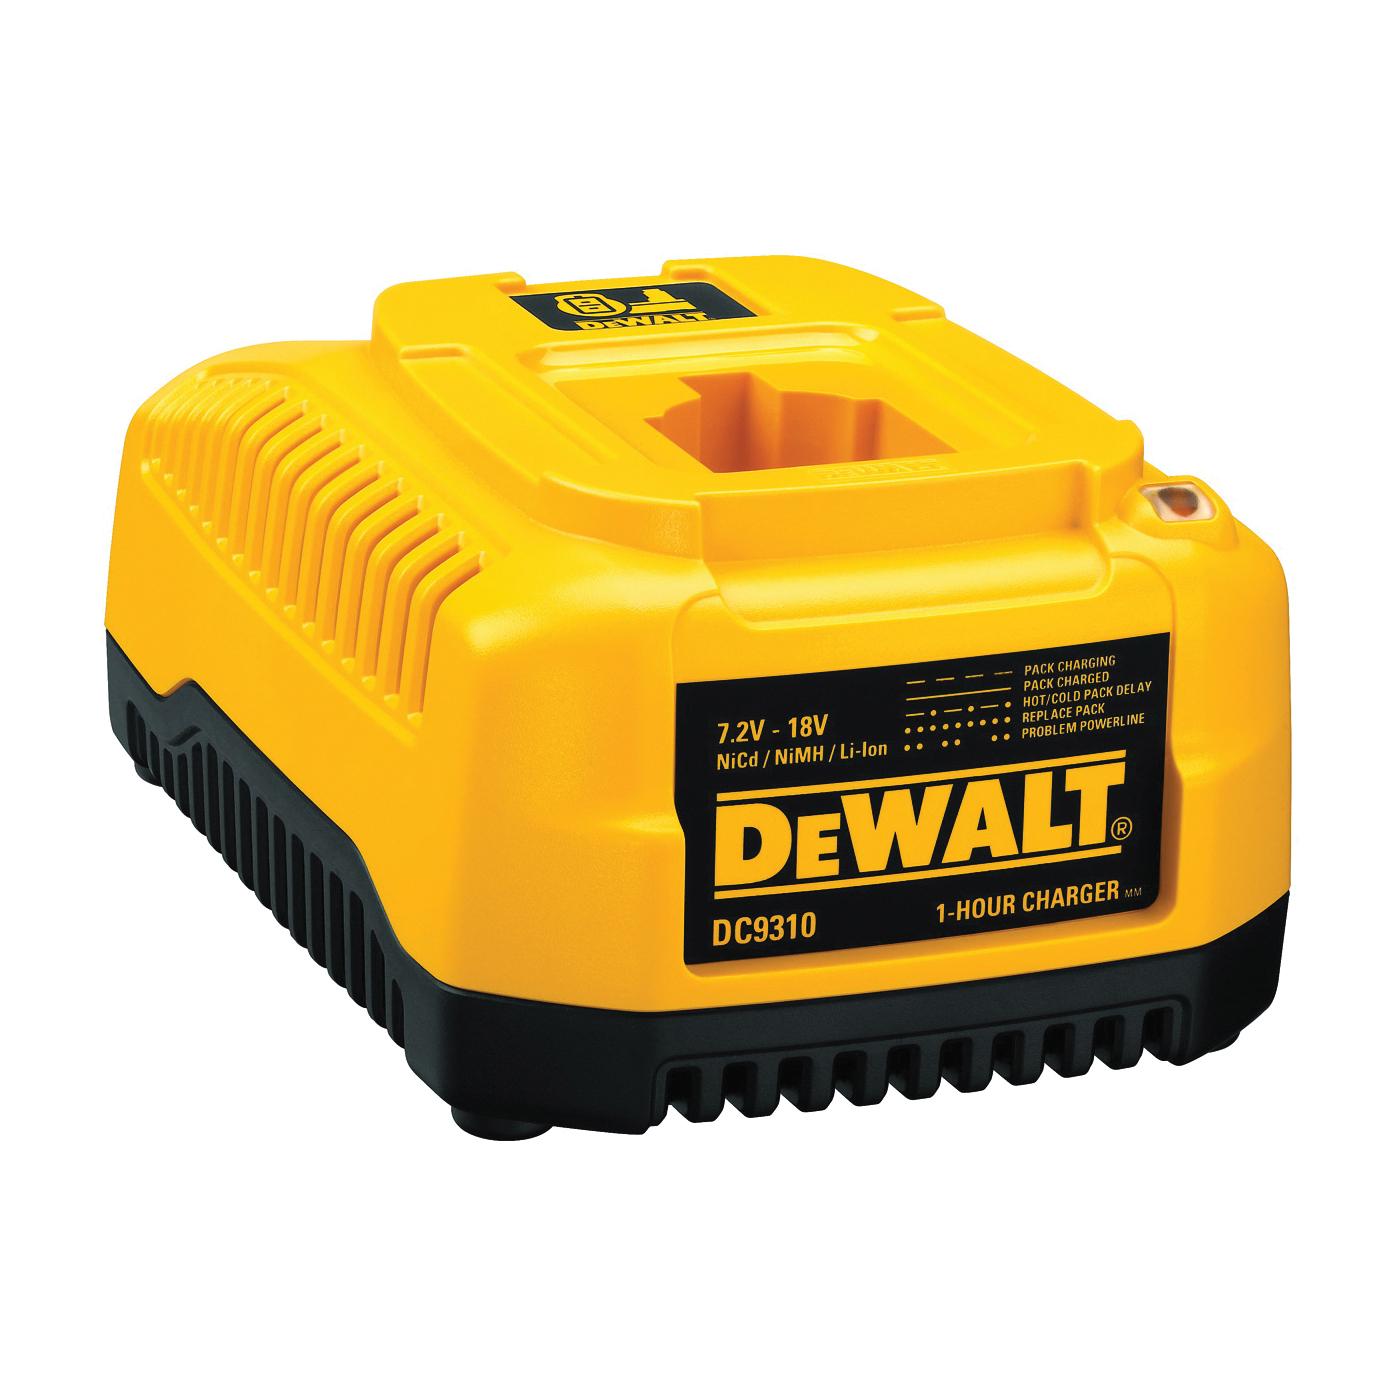 DeWalt DC9310